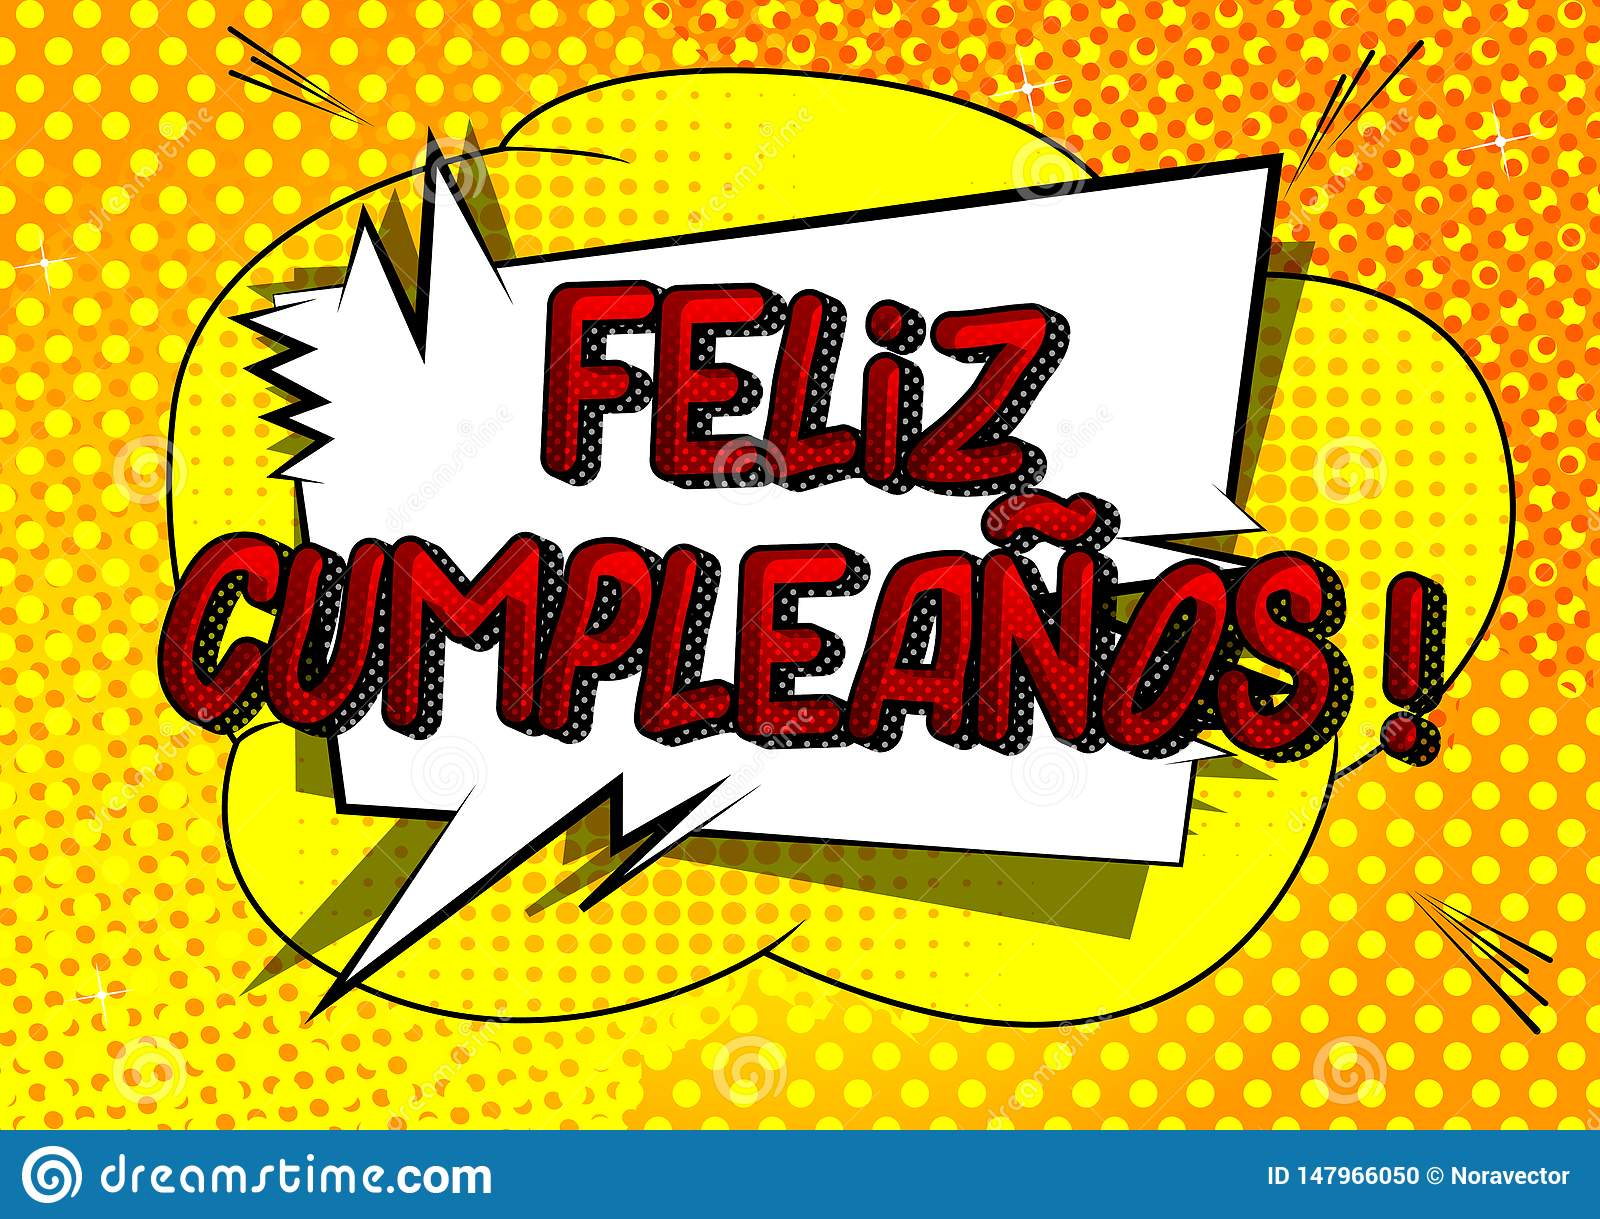 Feliz Cumpleanos Happy Birthday In Spanish Stock Vector